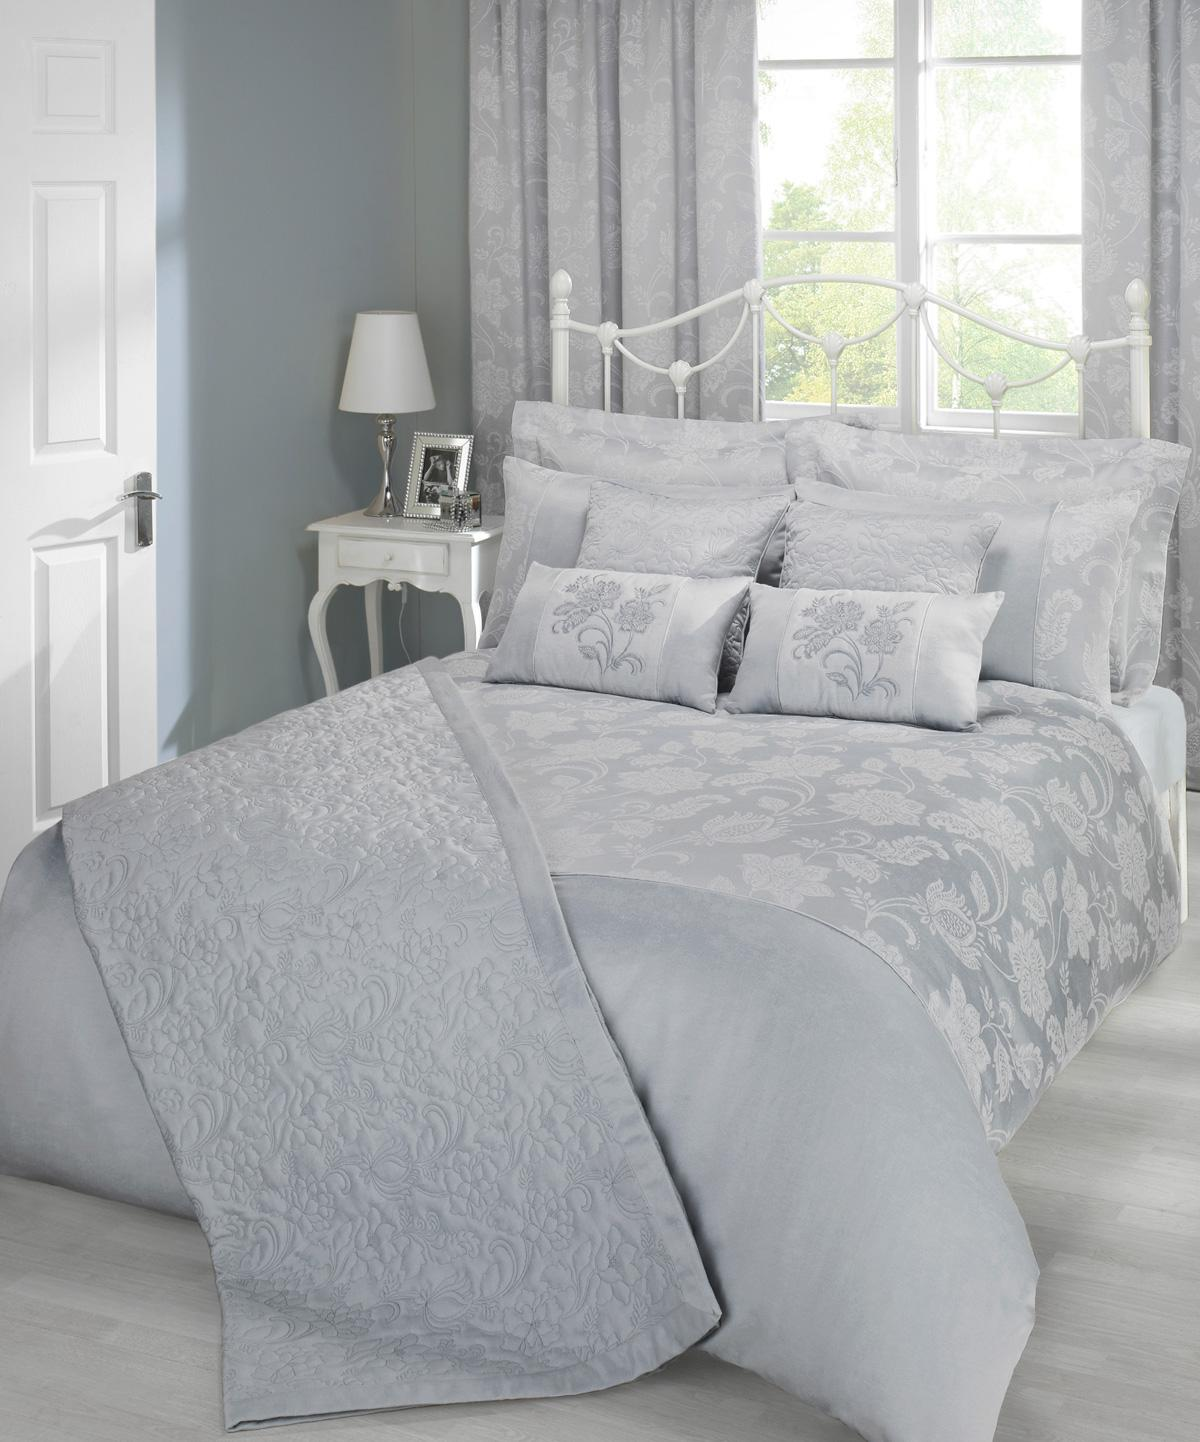 Silver Portofino Luxury Bedding by Julian Charles